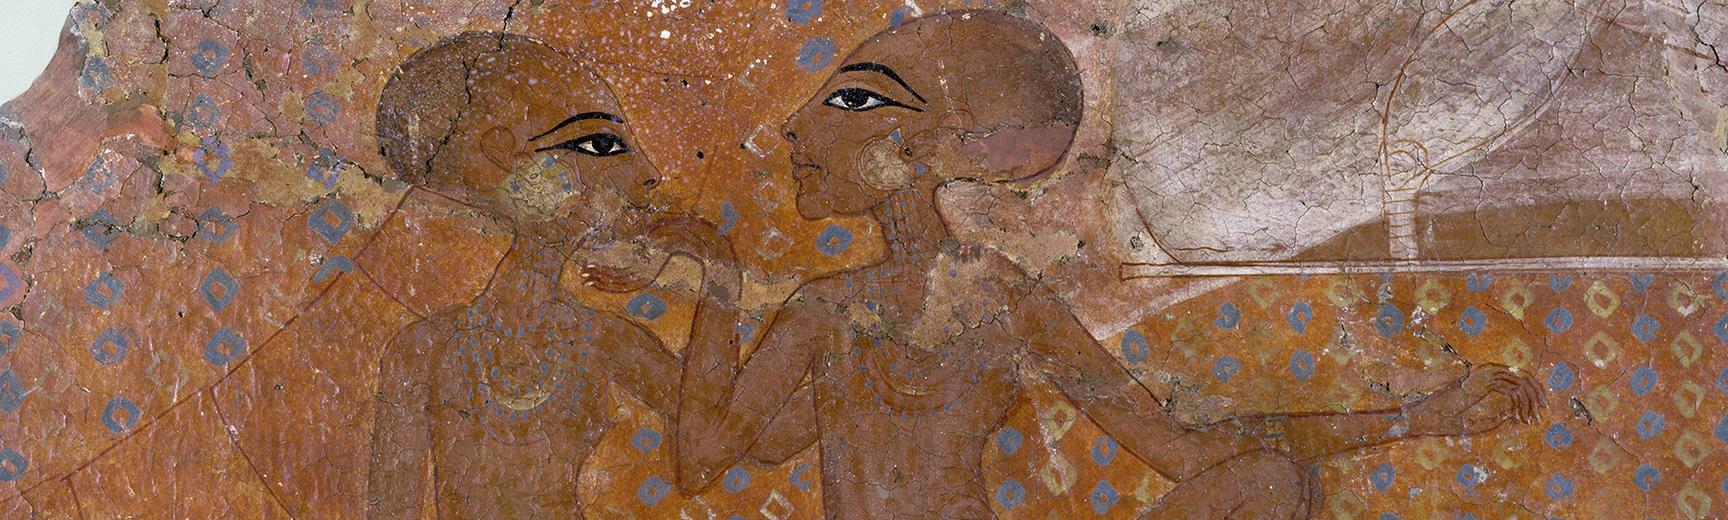 Fresco fragment with the daughter of Akhenaten and Nefertiti